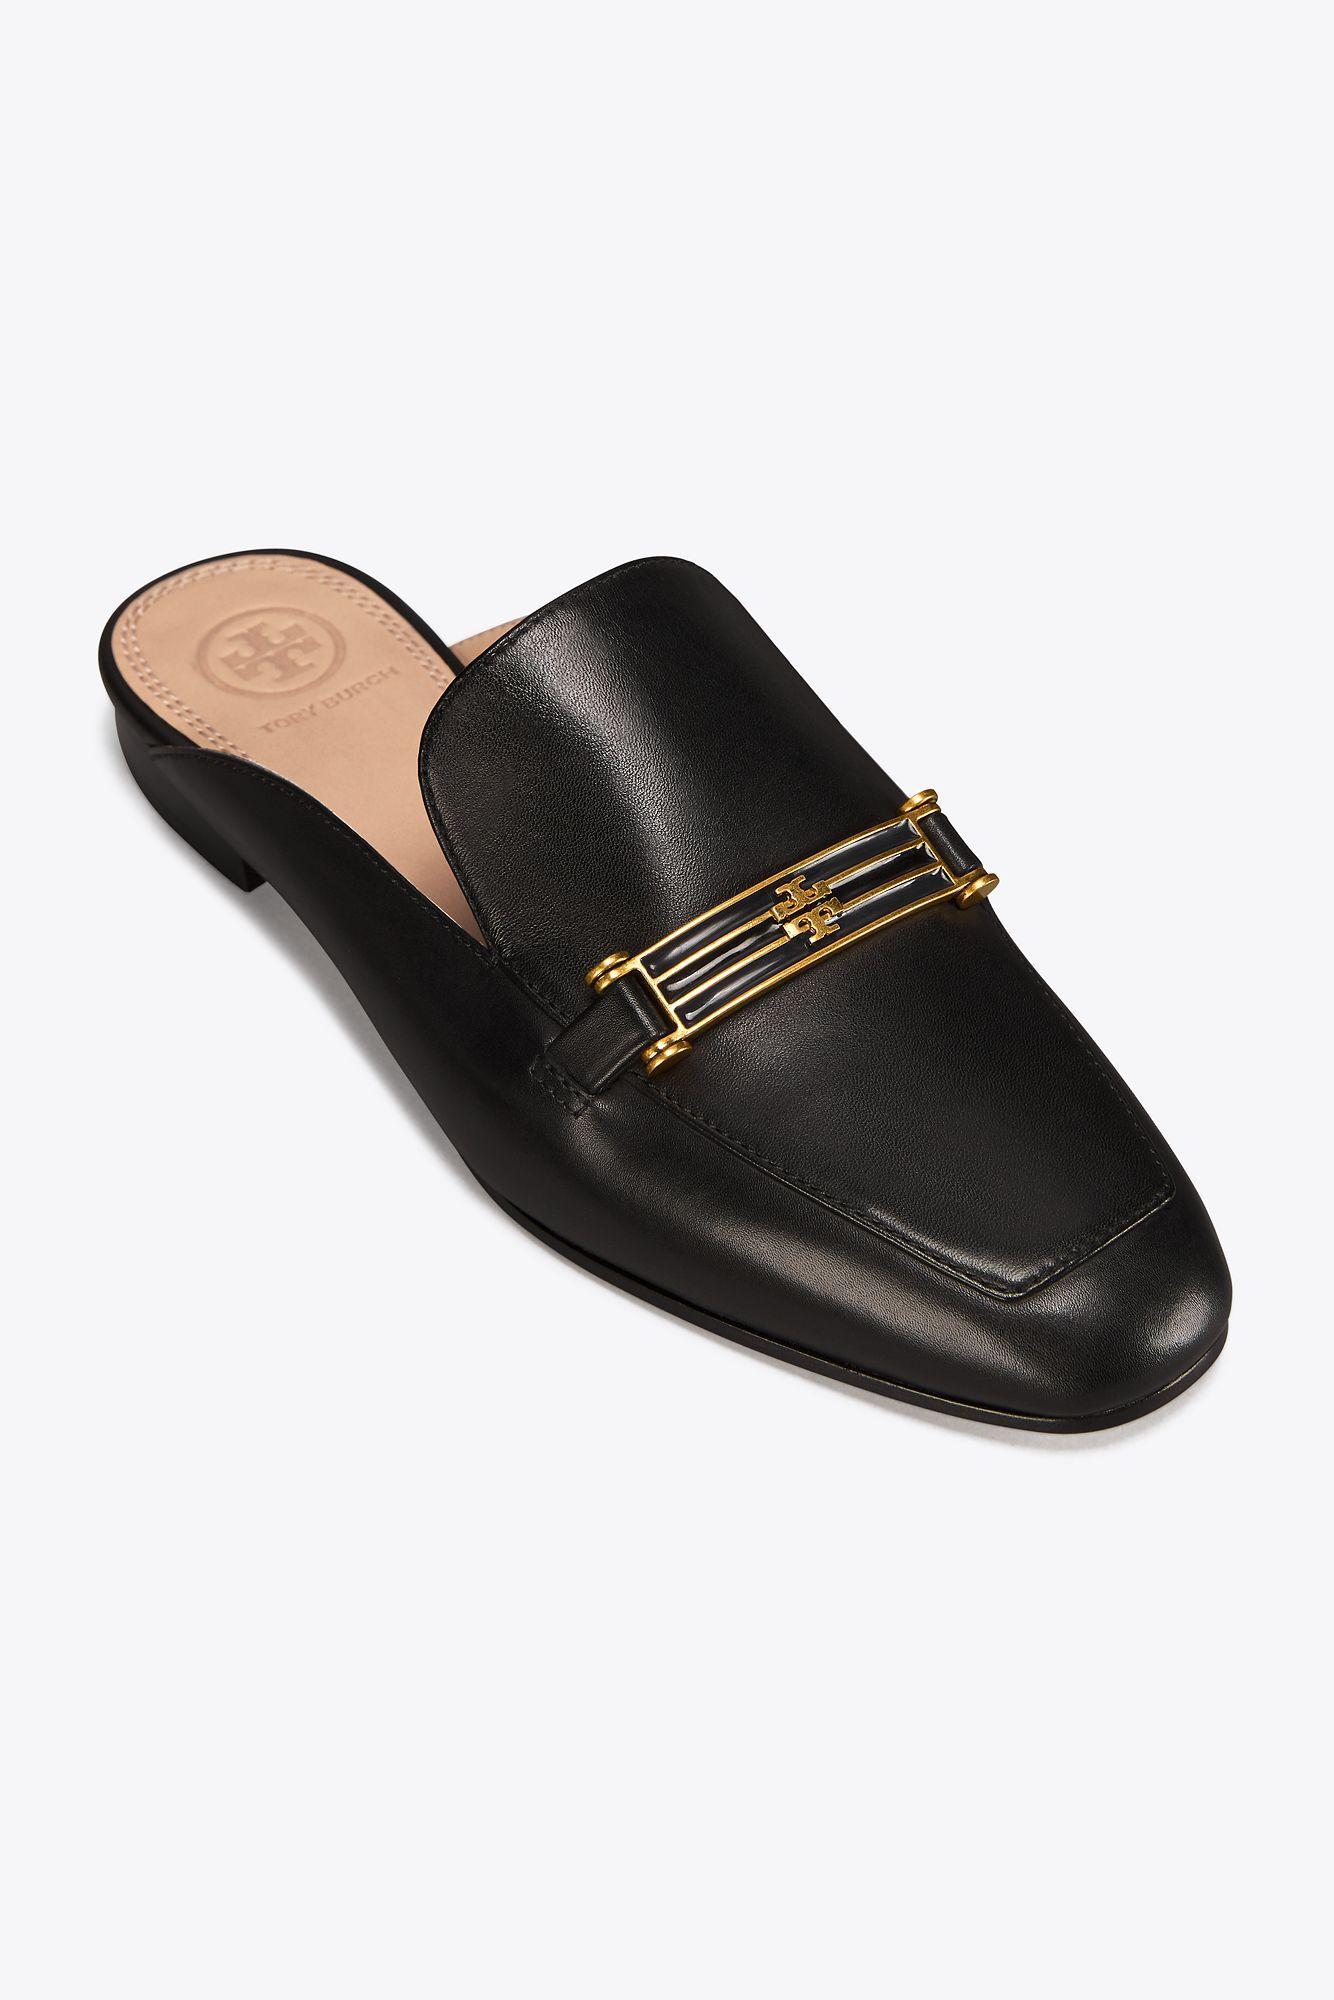 e3165089a367 Lyst - Tory Burch Amelia Slippers in Black